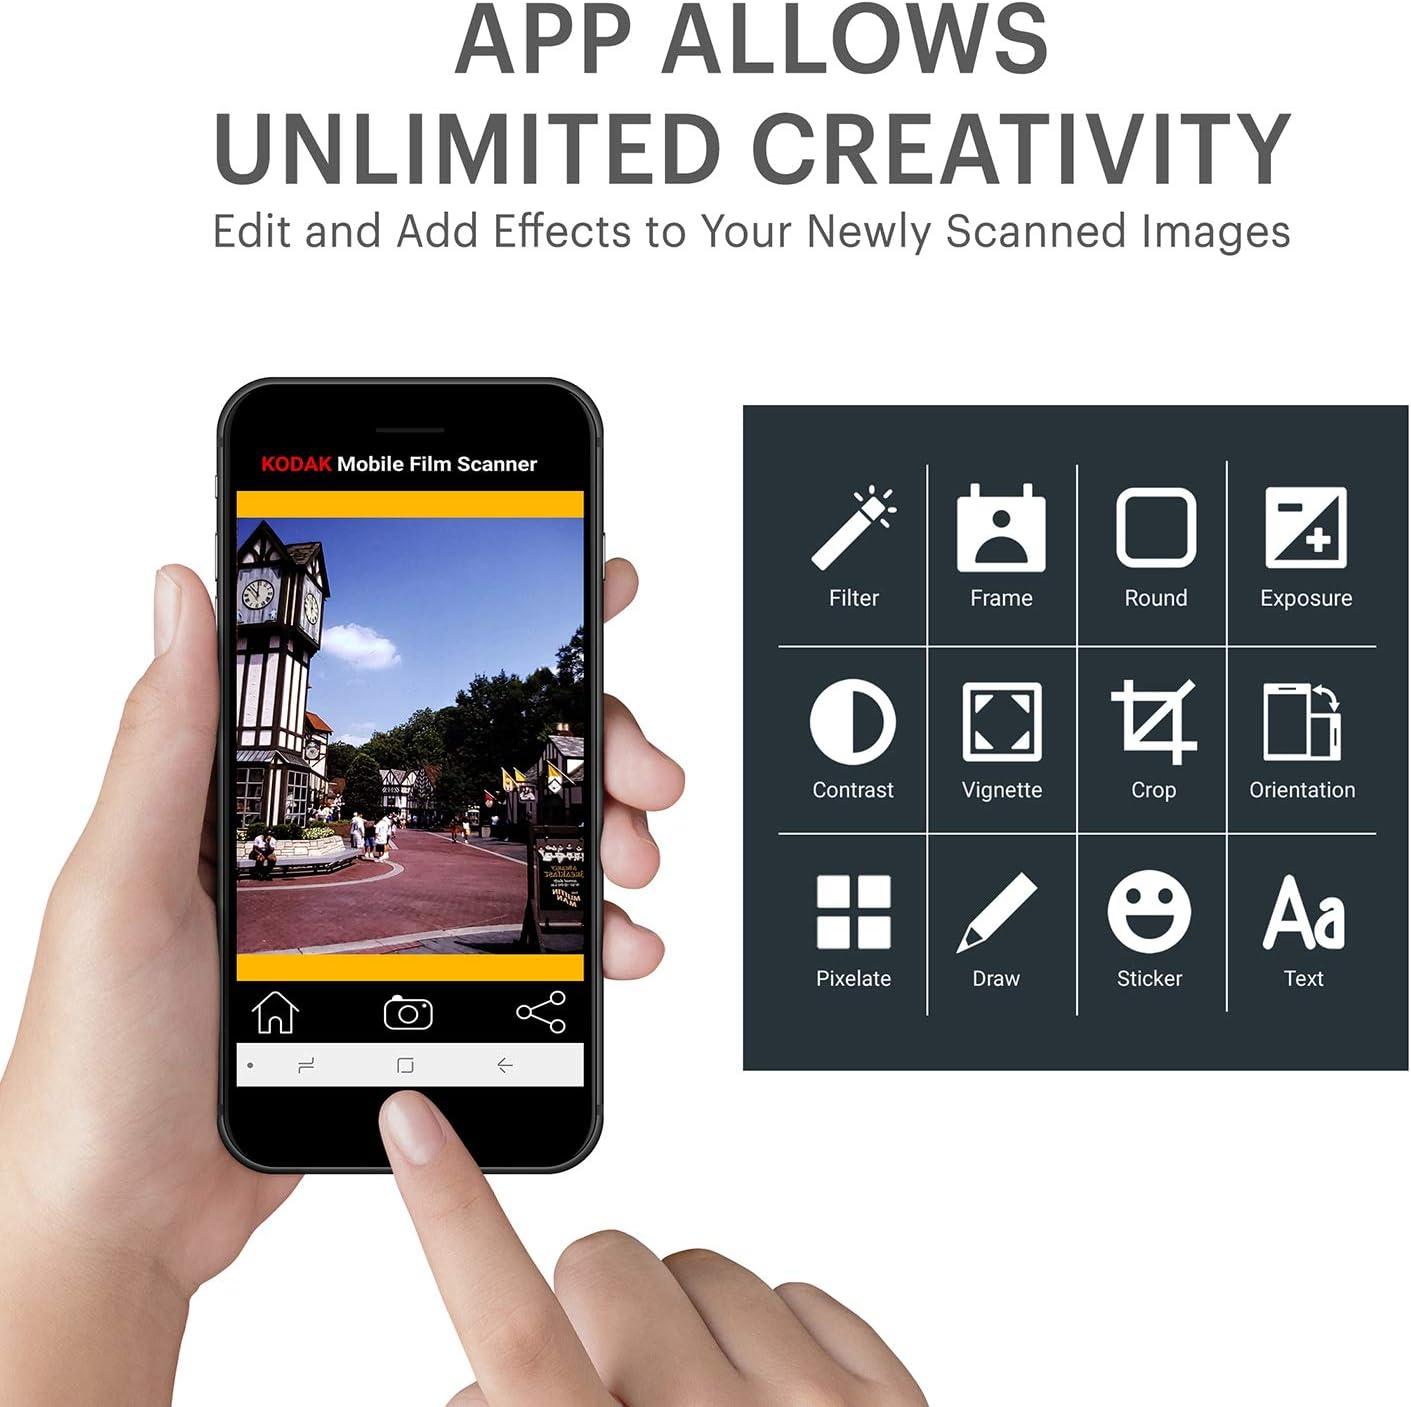 Cardboard Platform /& Eco-Friendly Toy LED Backlight KODAK Mobile Film Scanner Fun Novelty Scanner Lets You Scan and Play with Old 35mm Films /& Slides Using Your Smartphone Camera